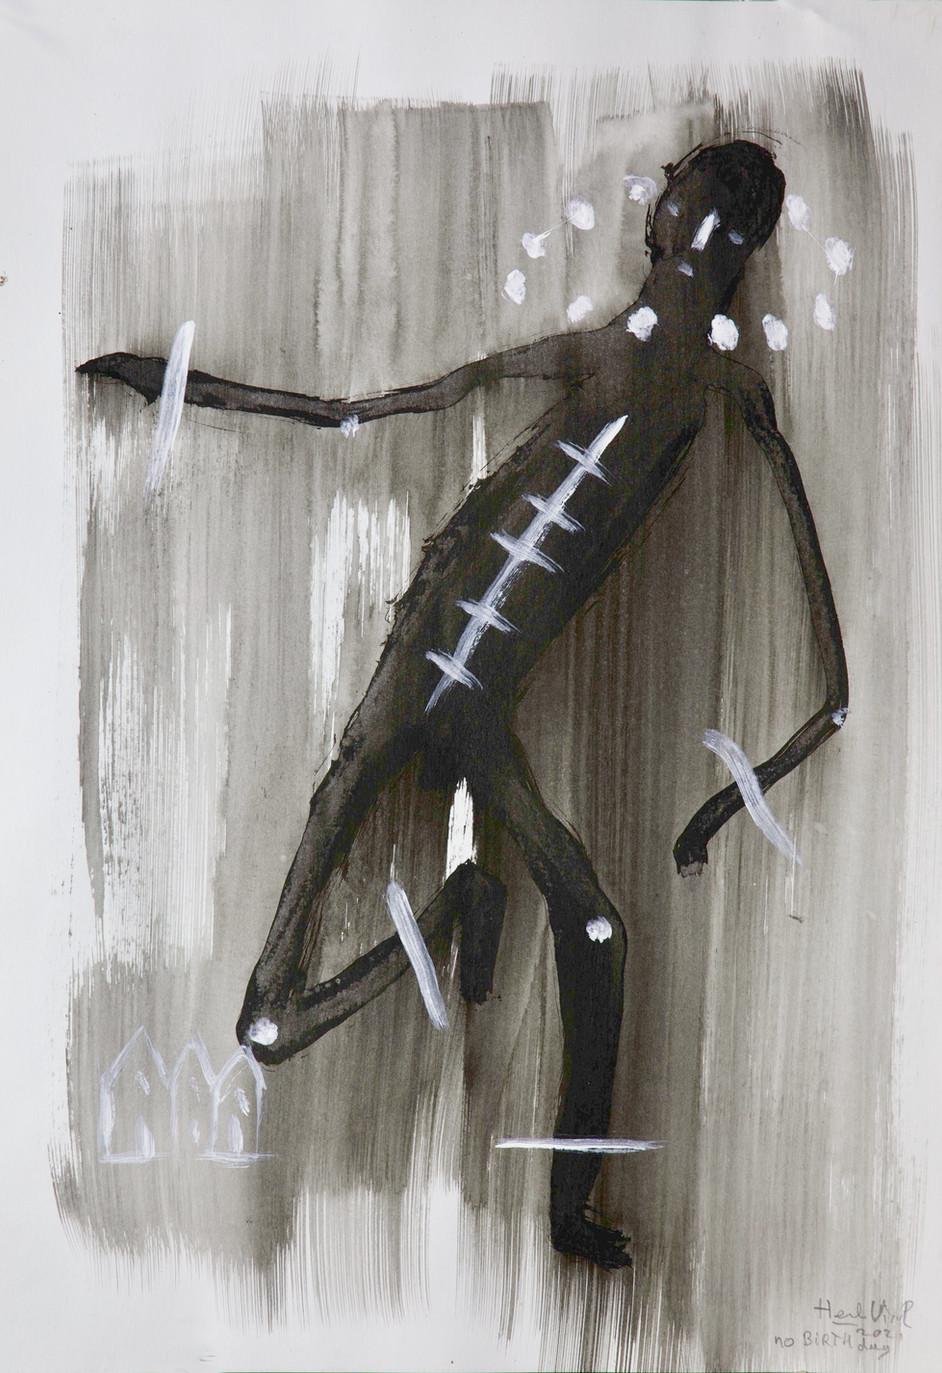 HENK VISCH No birthday, 2021 watercolor and pencil on paper 42 x 29,7 cm